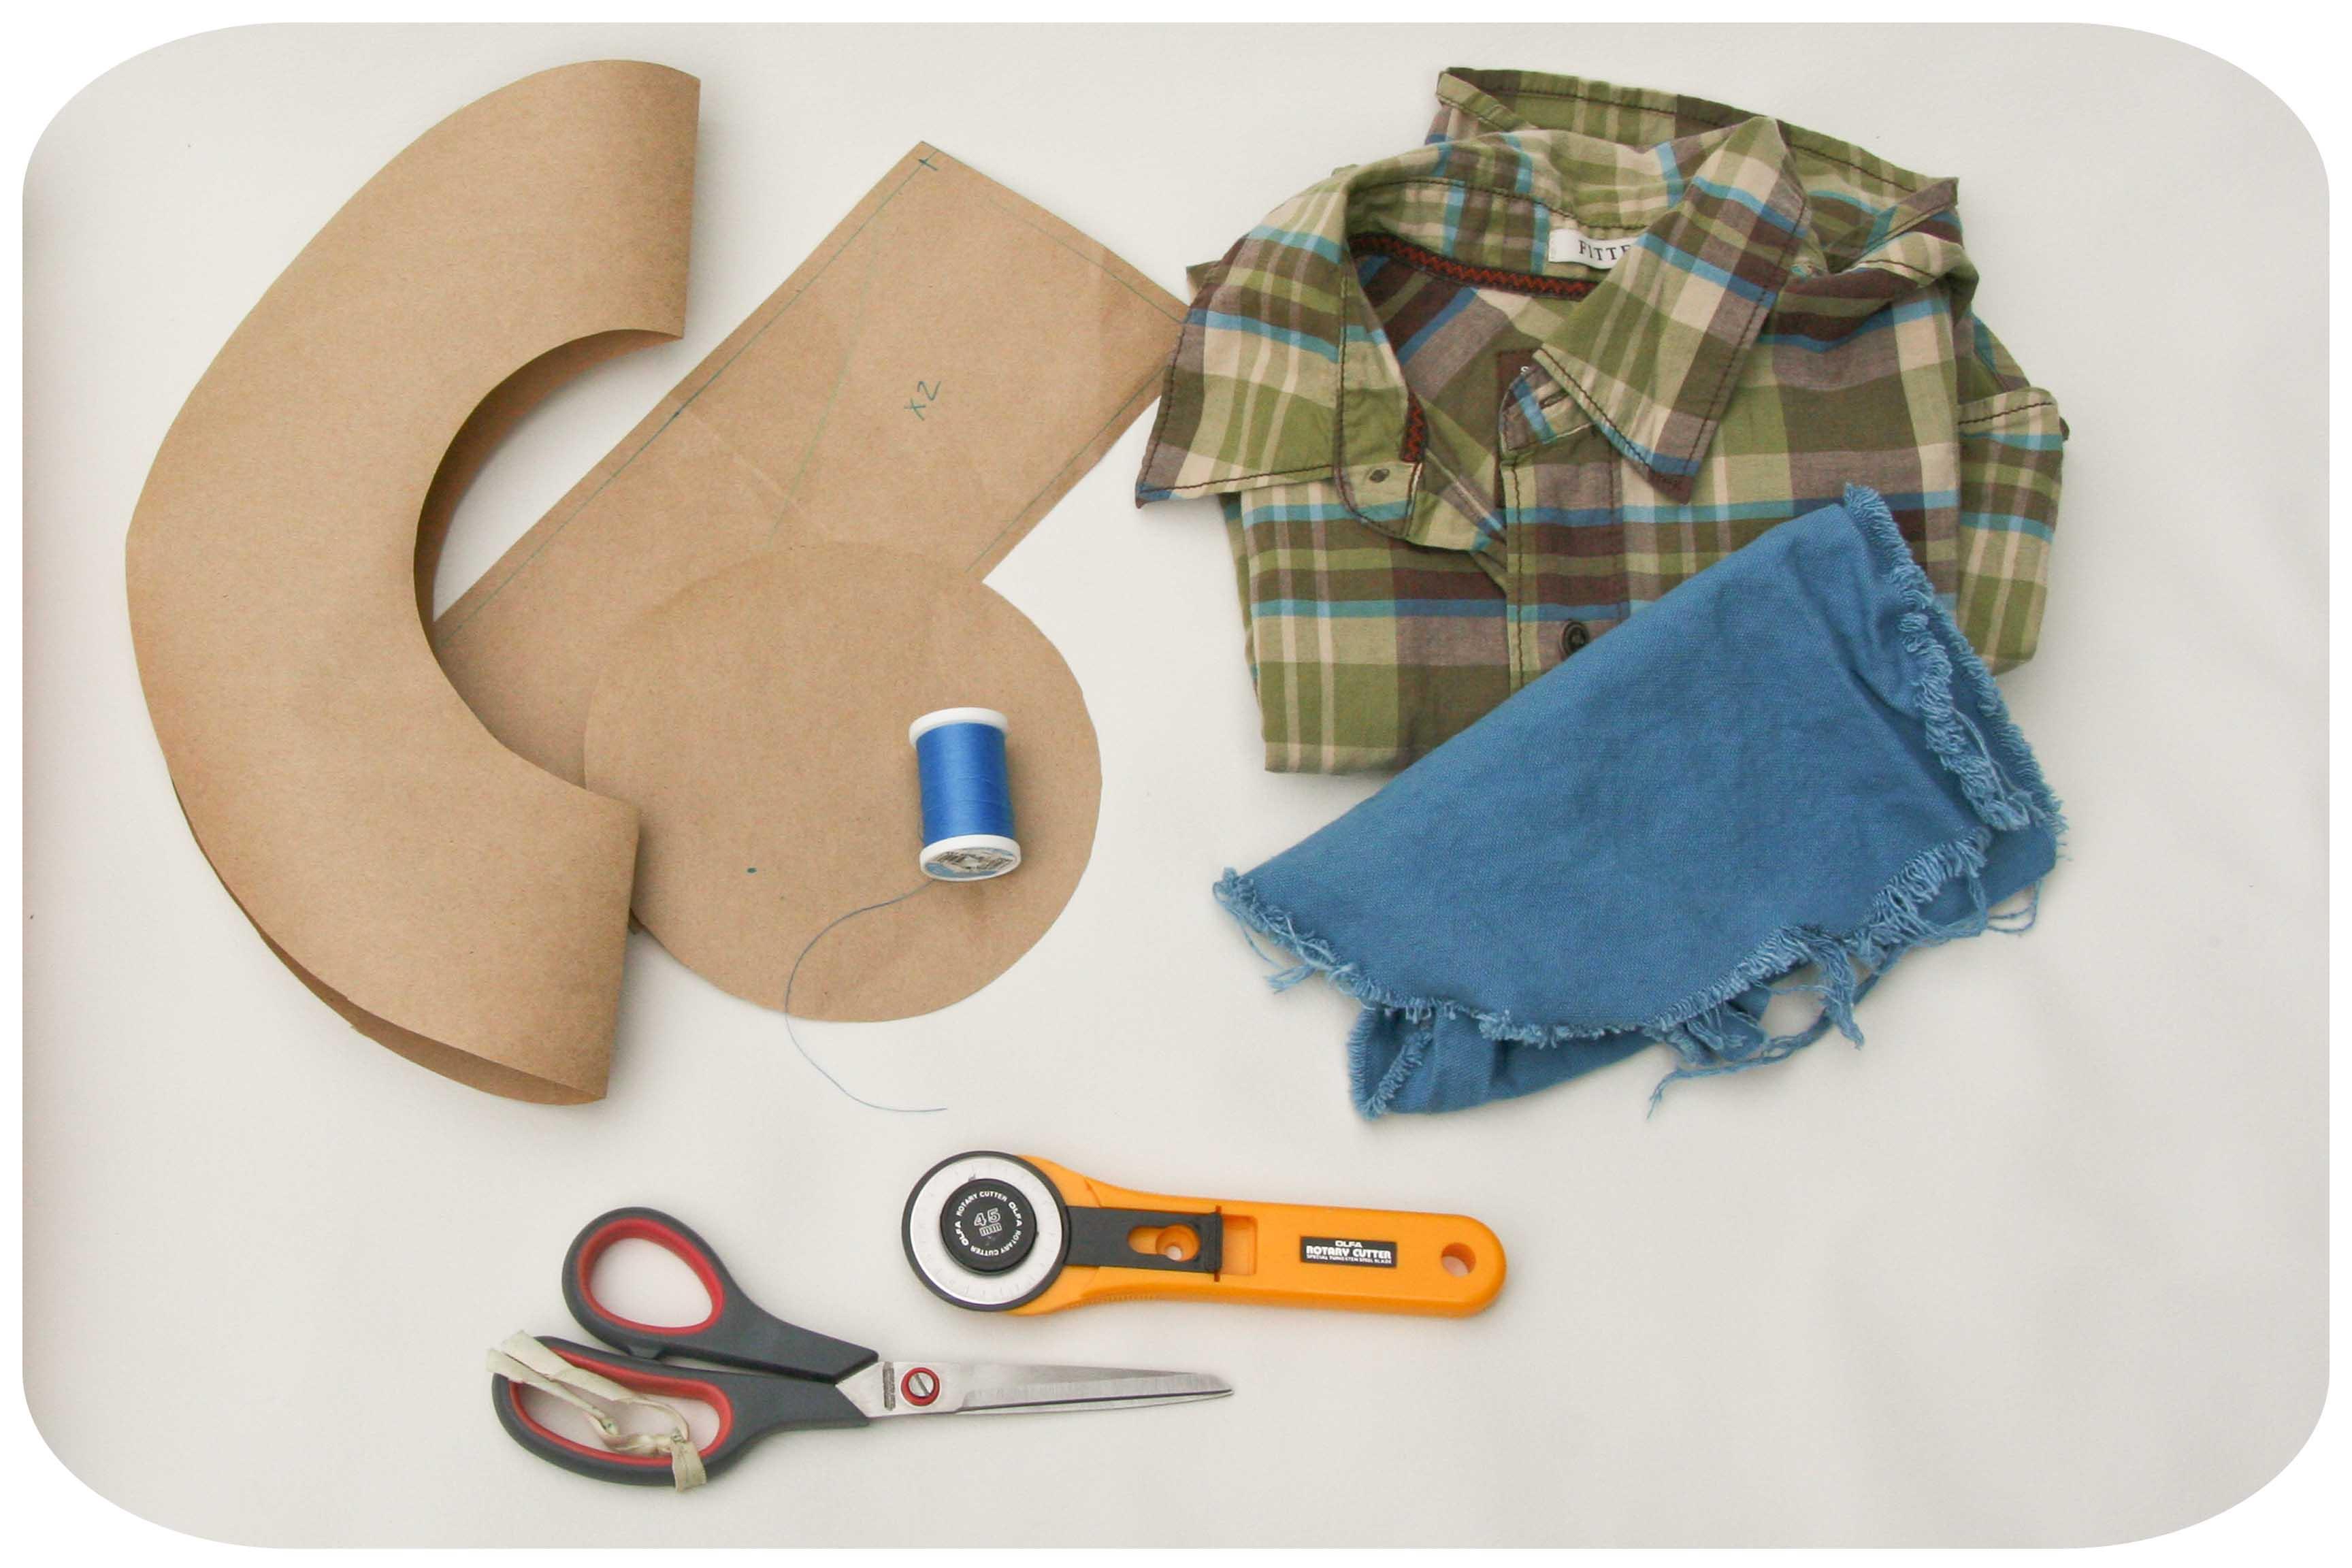 76b5b8f5804 Summer Bucket Hat Tutorial. Materials  Pattern. Fabric. Thread